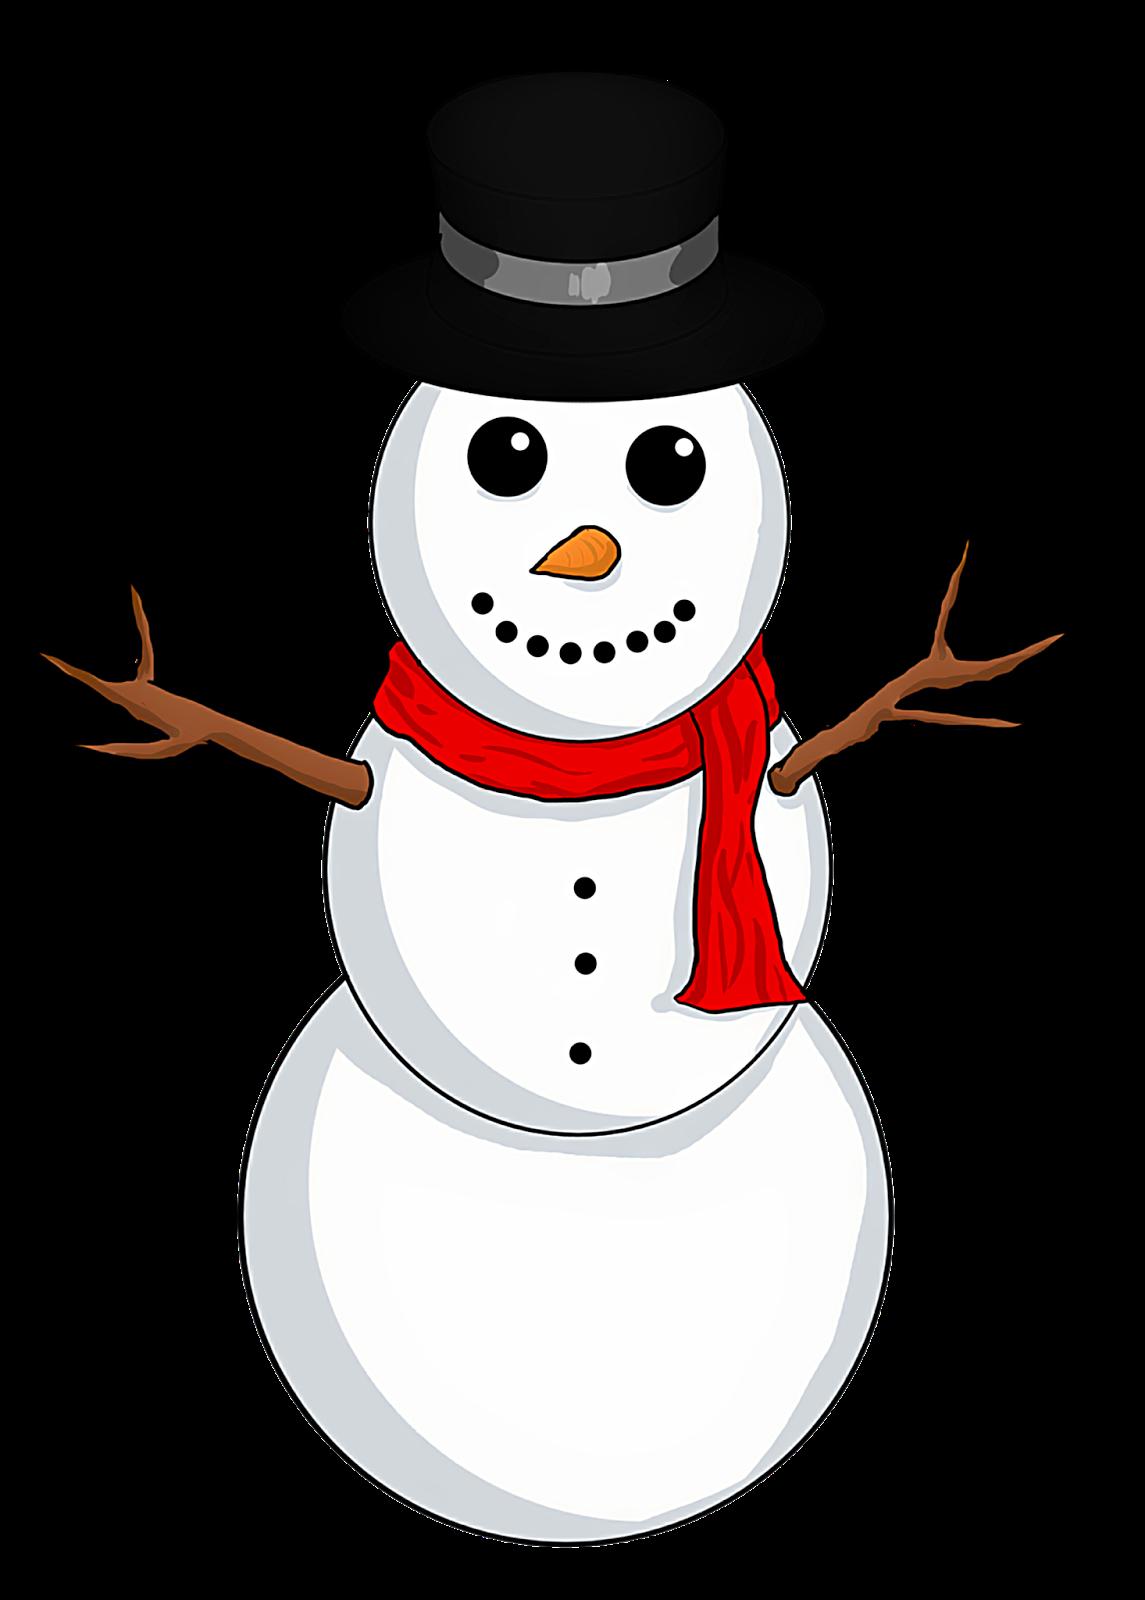 Snowman clipart happy, Snowman happy Transparent FREE for.